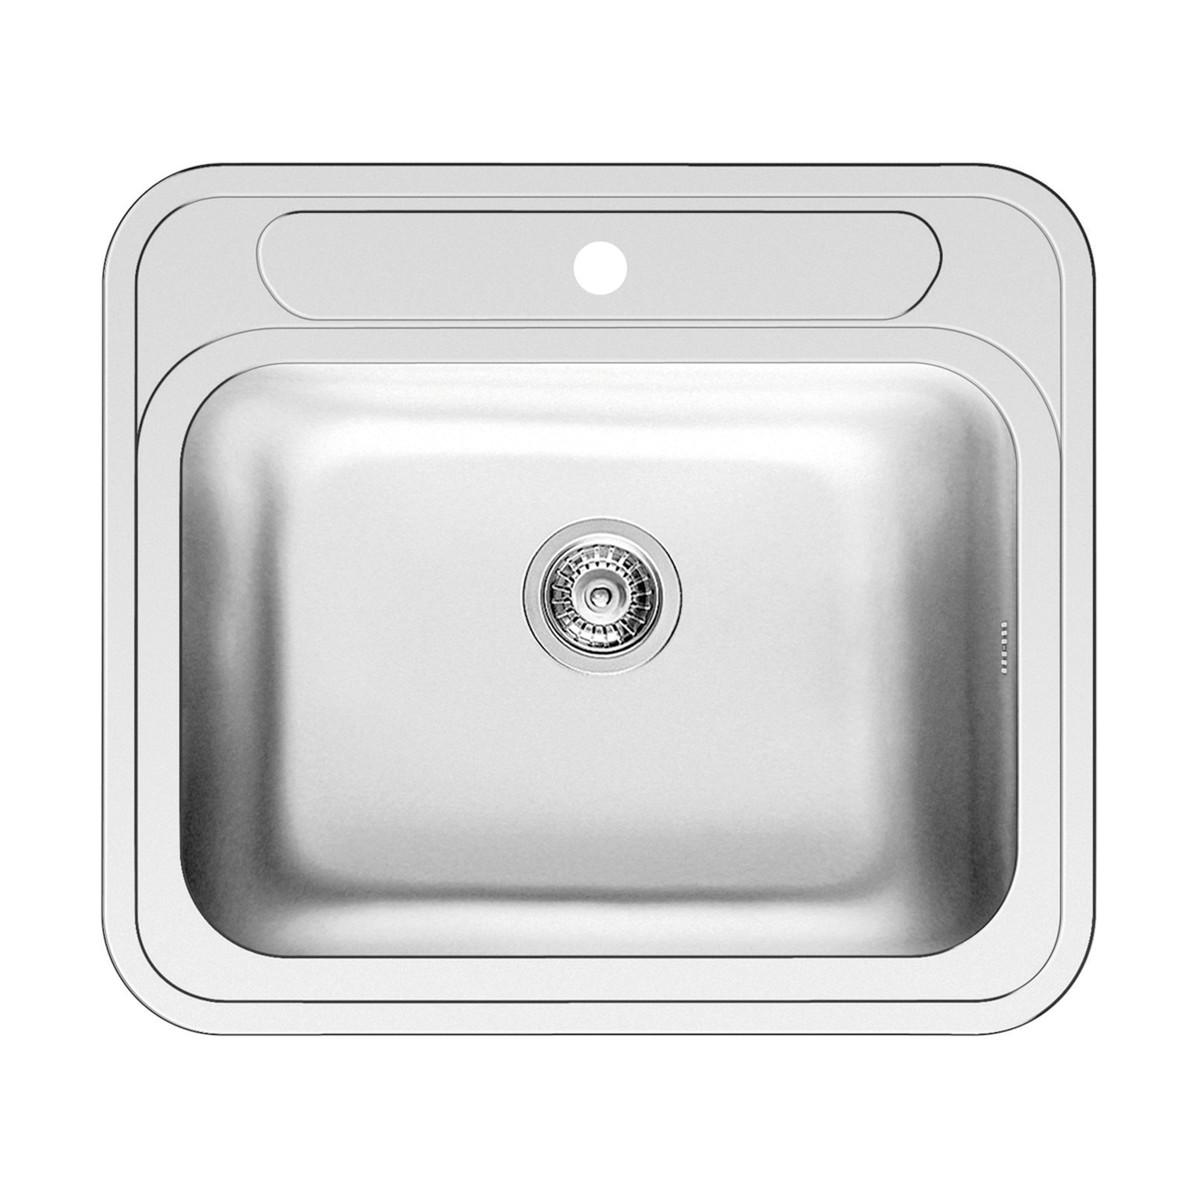 Lavello incasso kubo l 58 x p 51 cm 1 vasca prezzi e offerte online - Lavelli cucina fragranite prezzi ...